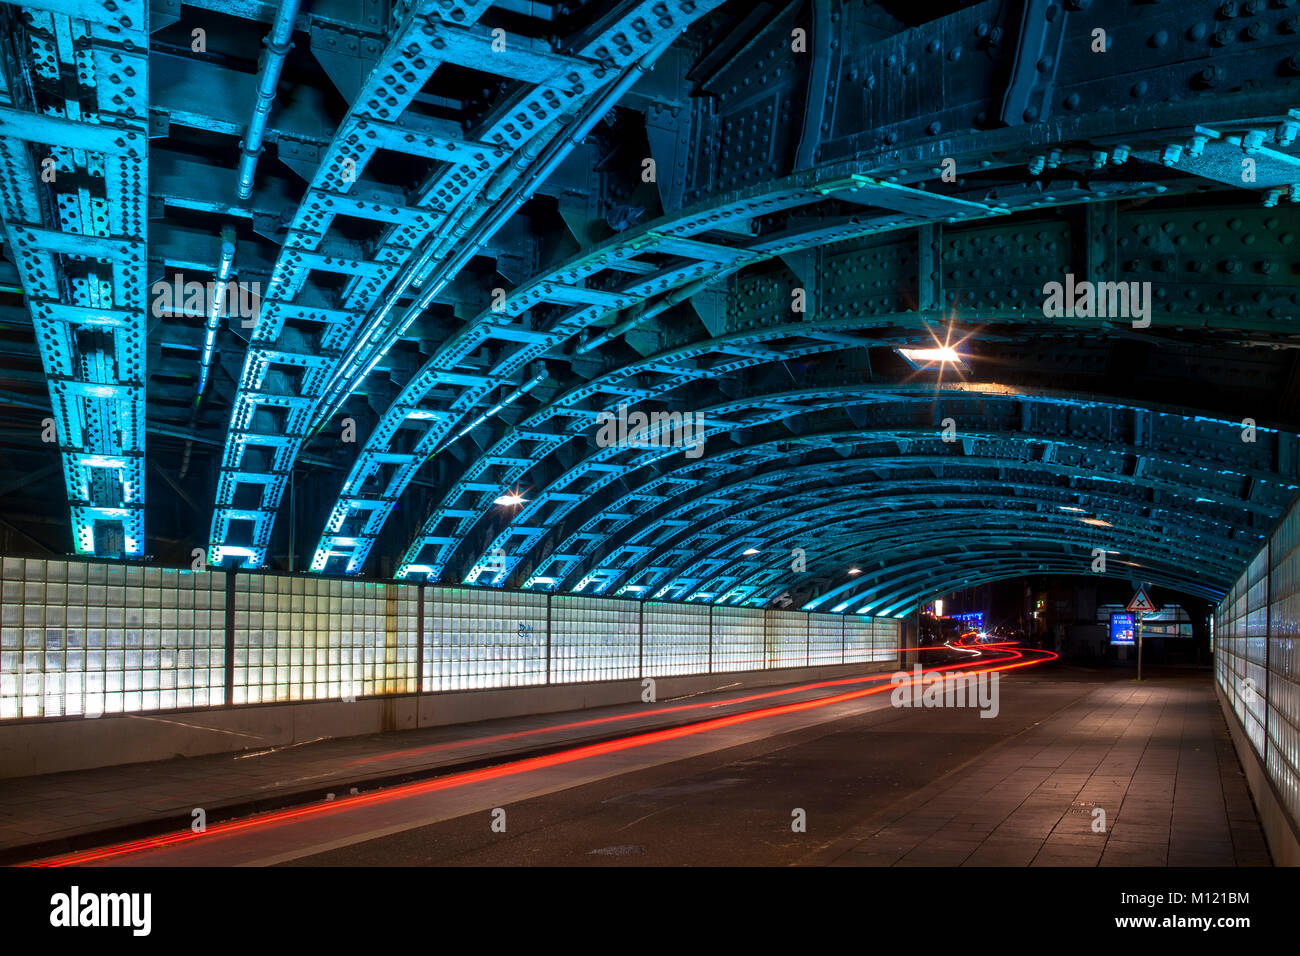 Germany, Cologne, illuminated railway underpass at the streets Eigelstein/Marzellenstrasse.  Deutschland, Koeln, - Stock Image